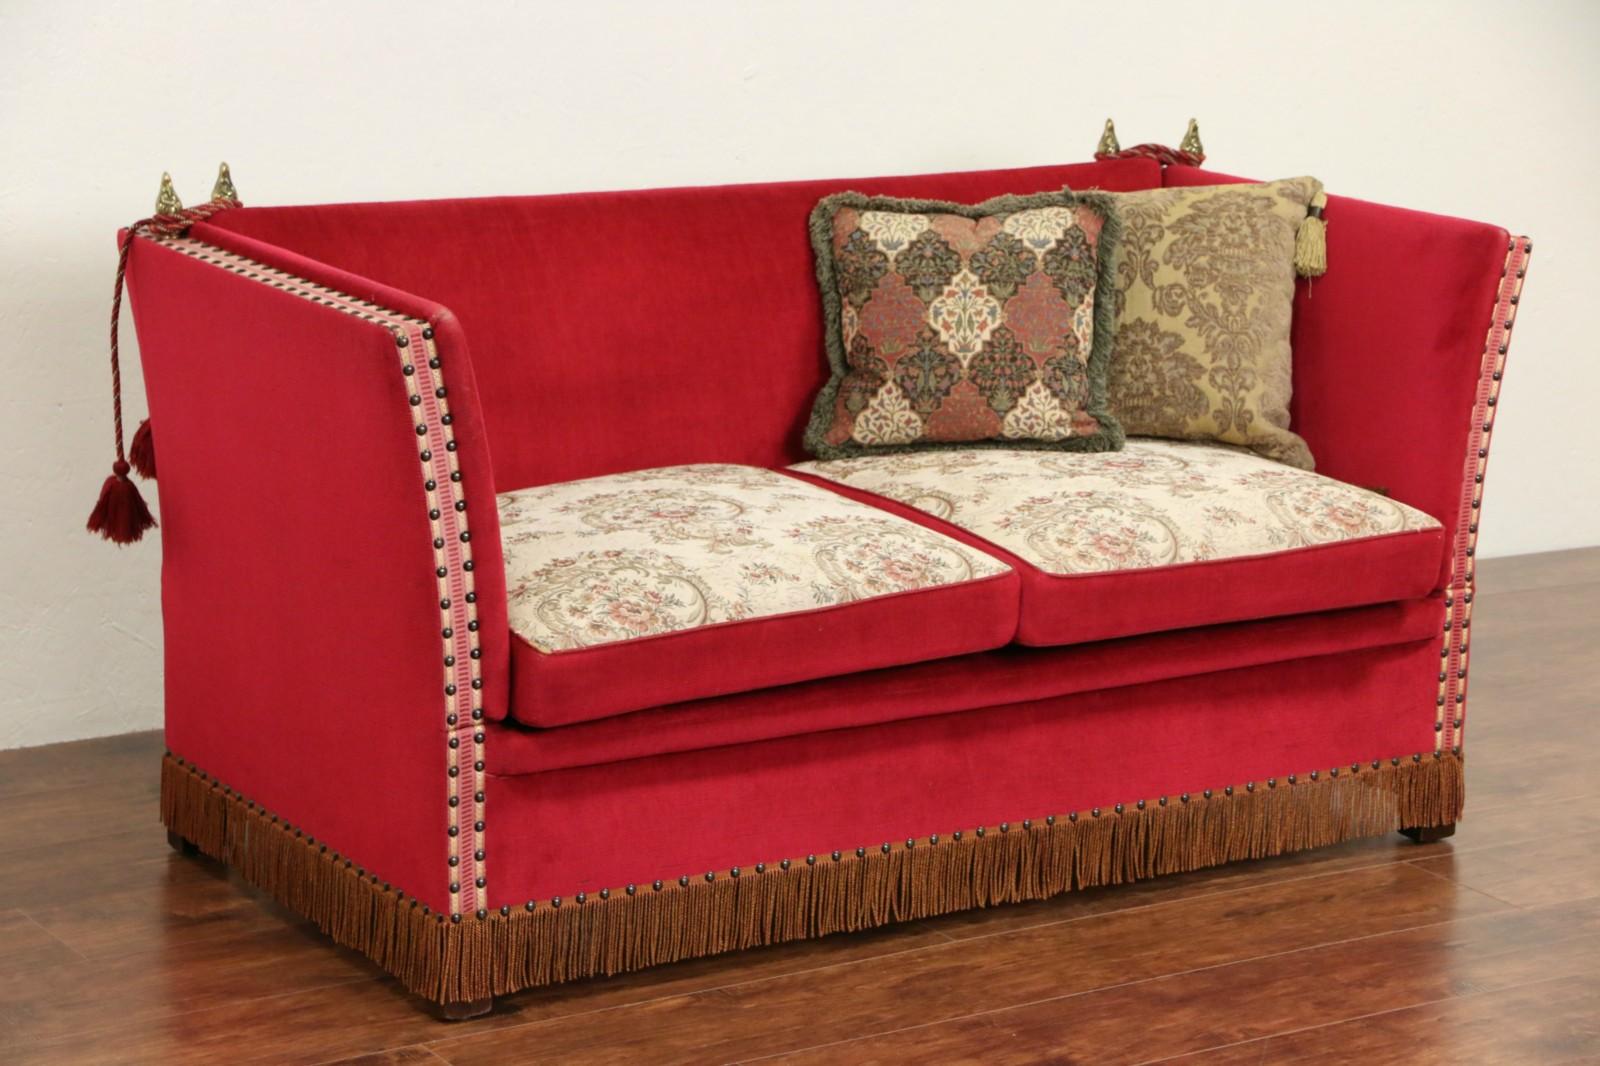 Beautiful Spanish Adjustable Dropside 1930 Vintage Sofa Or Settee With Fringe